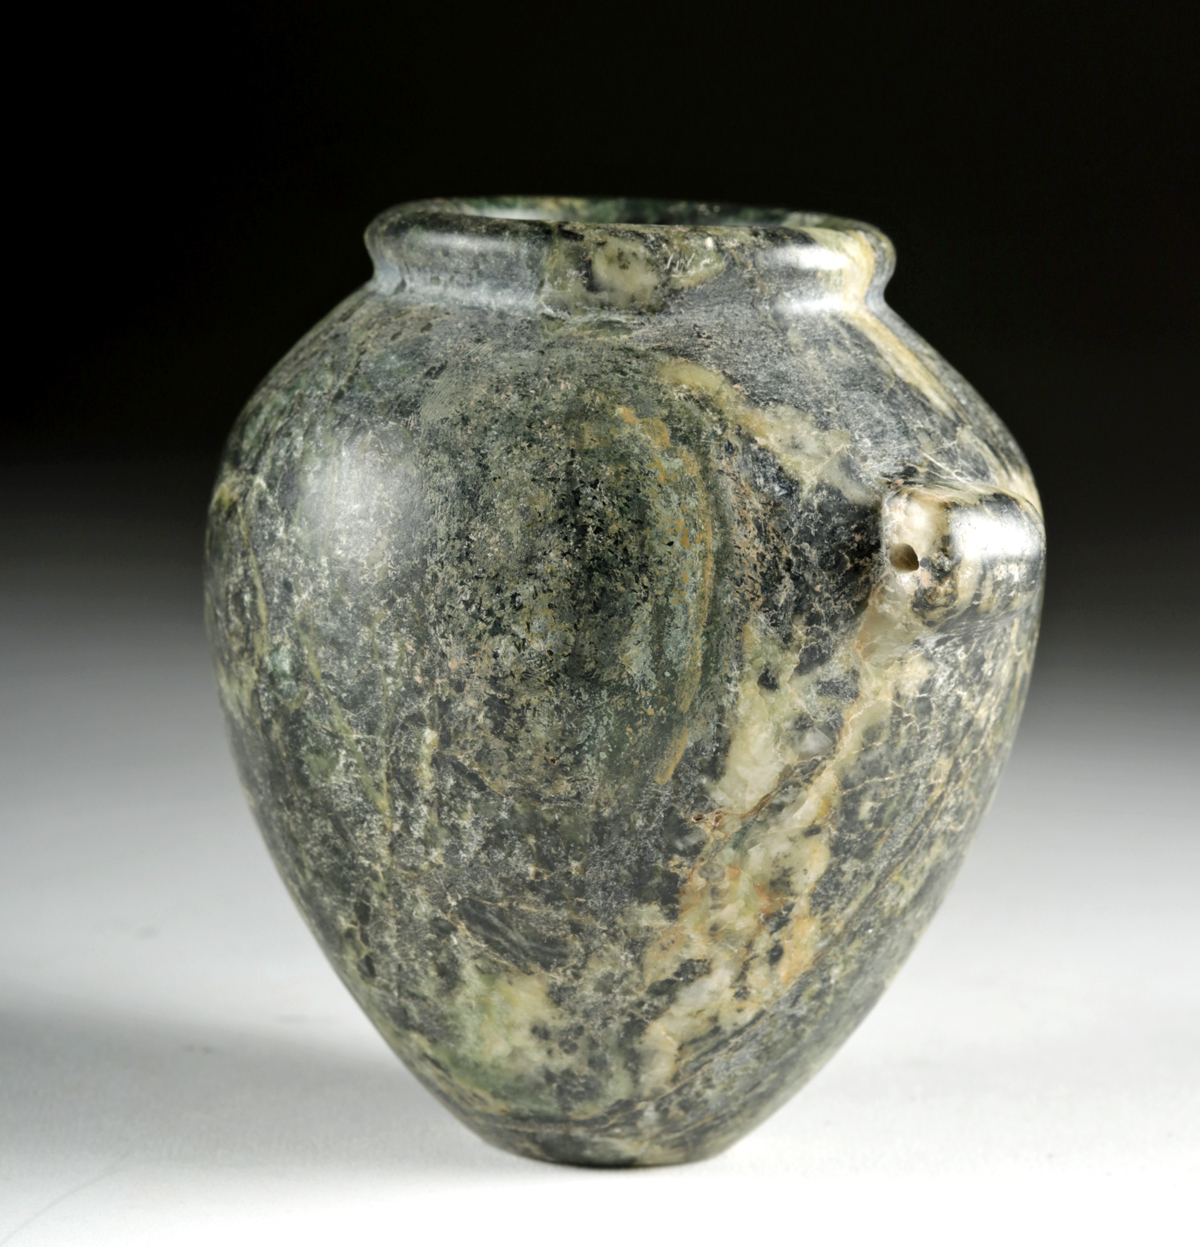 Lot 1 - Egyptian Pre-Dynastic Serpentine Acorn Shaped Jar